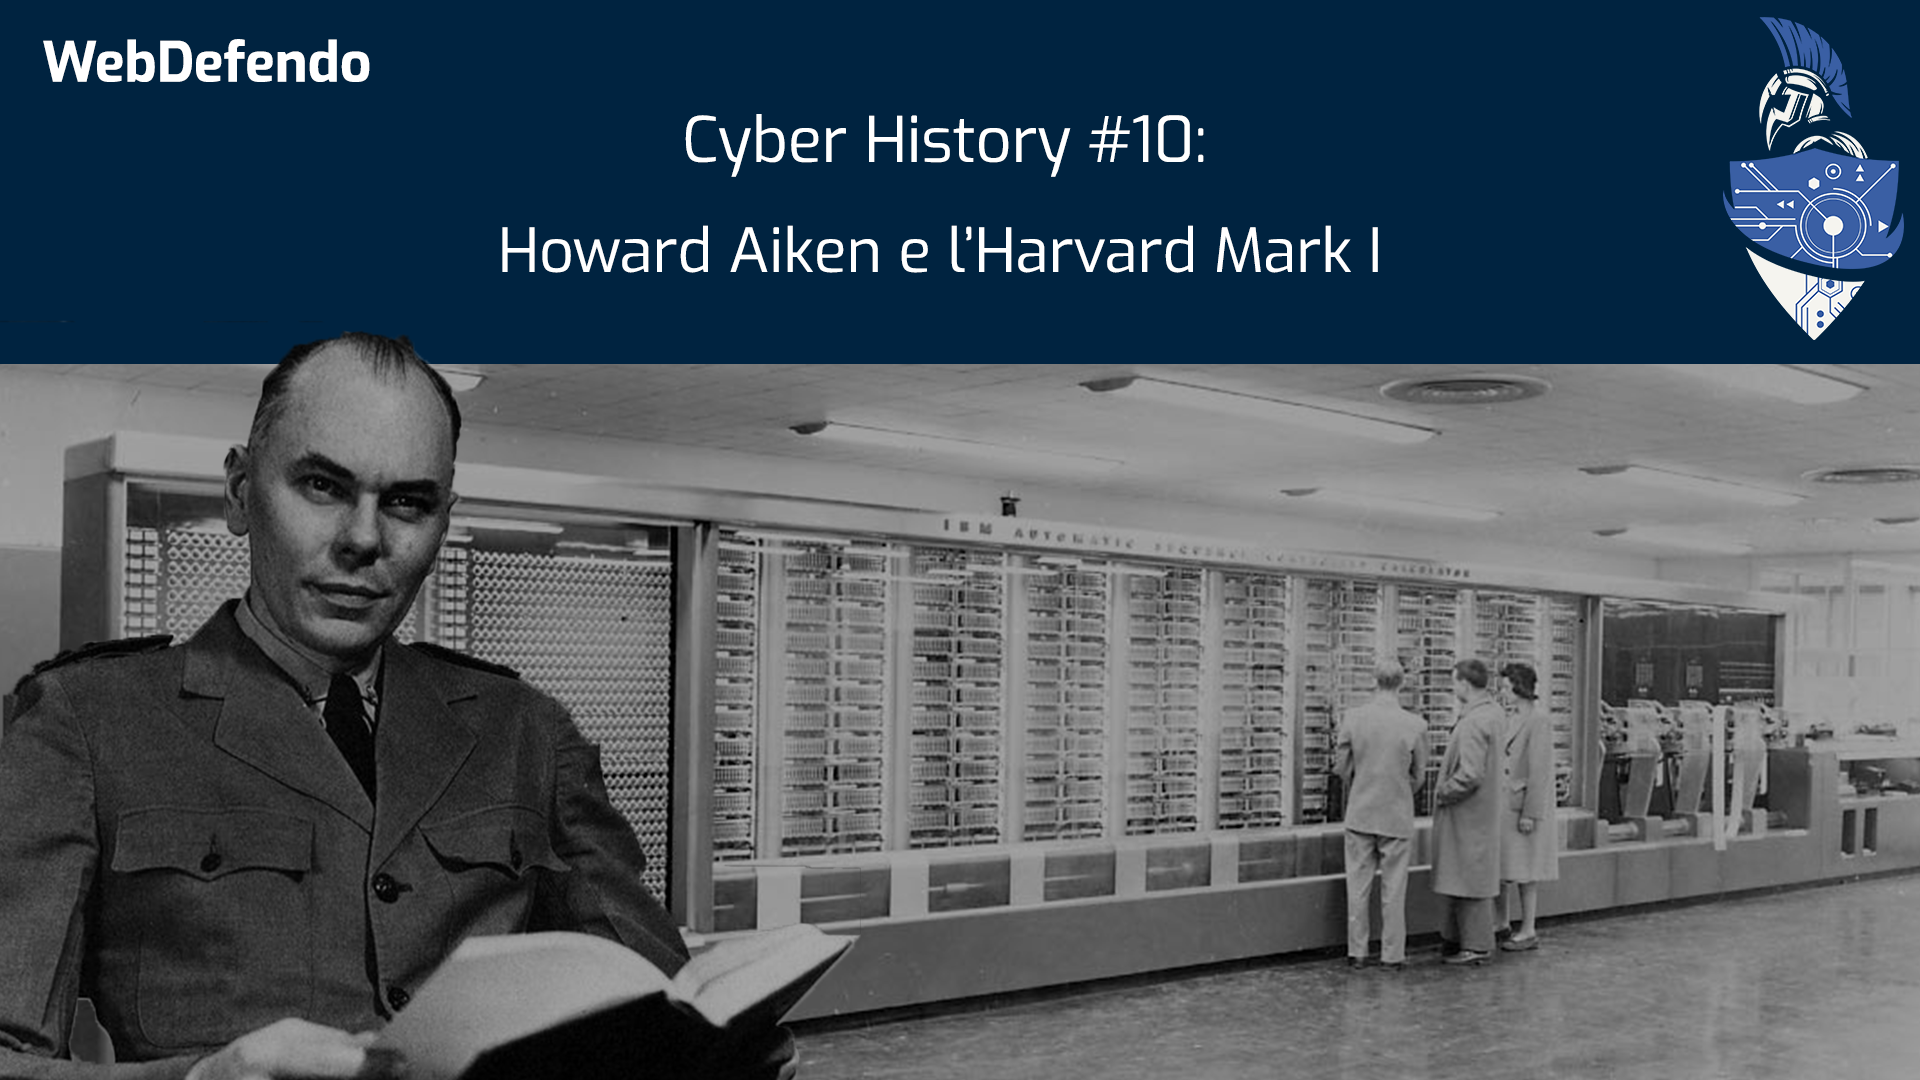 Cyber History #10: Howard Aiken e Harvard Mark I